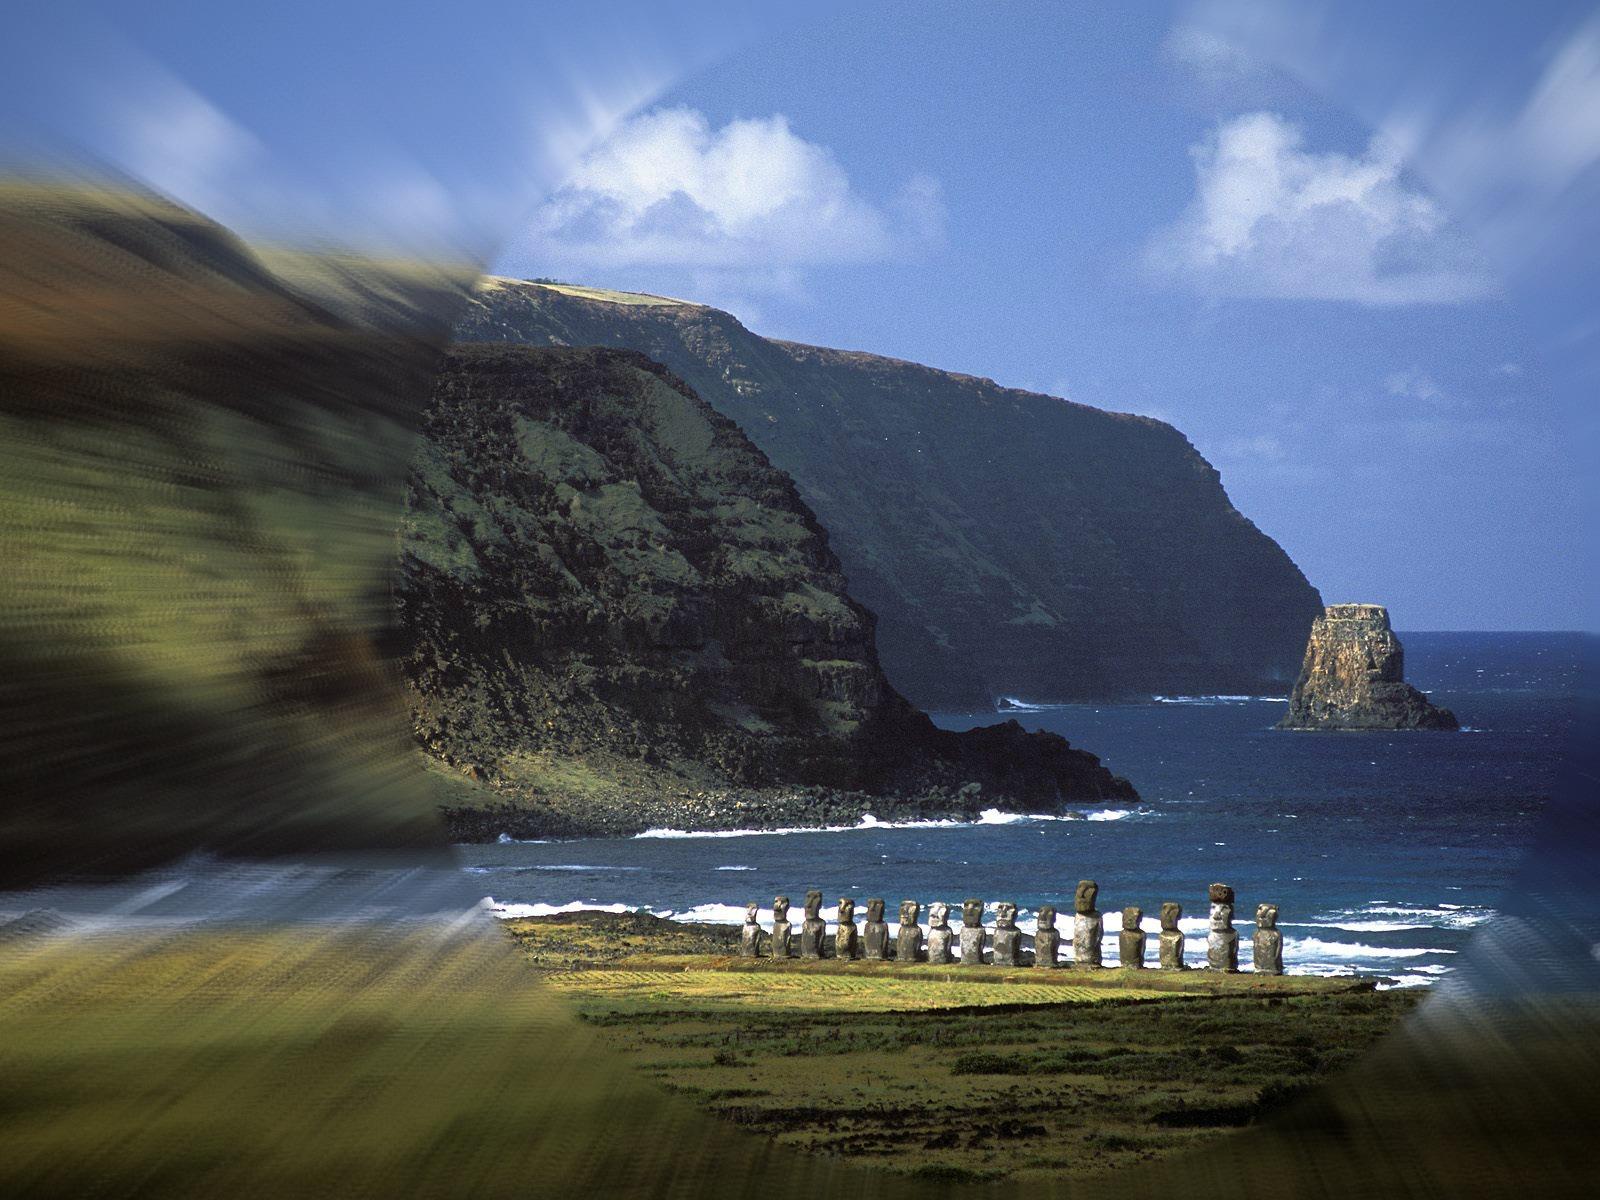 Moai-Statues-Easter-Island-2